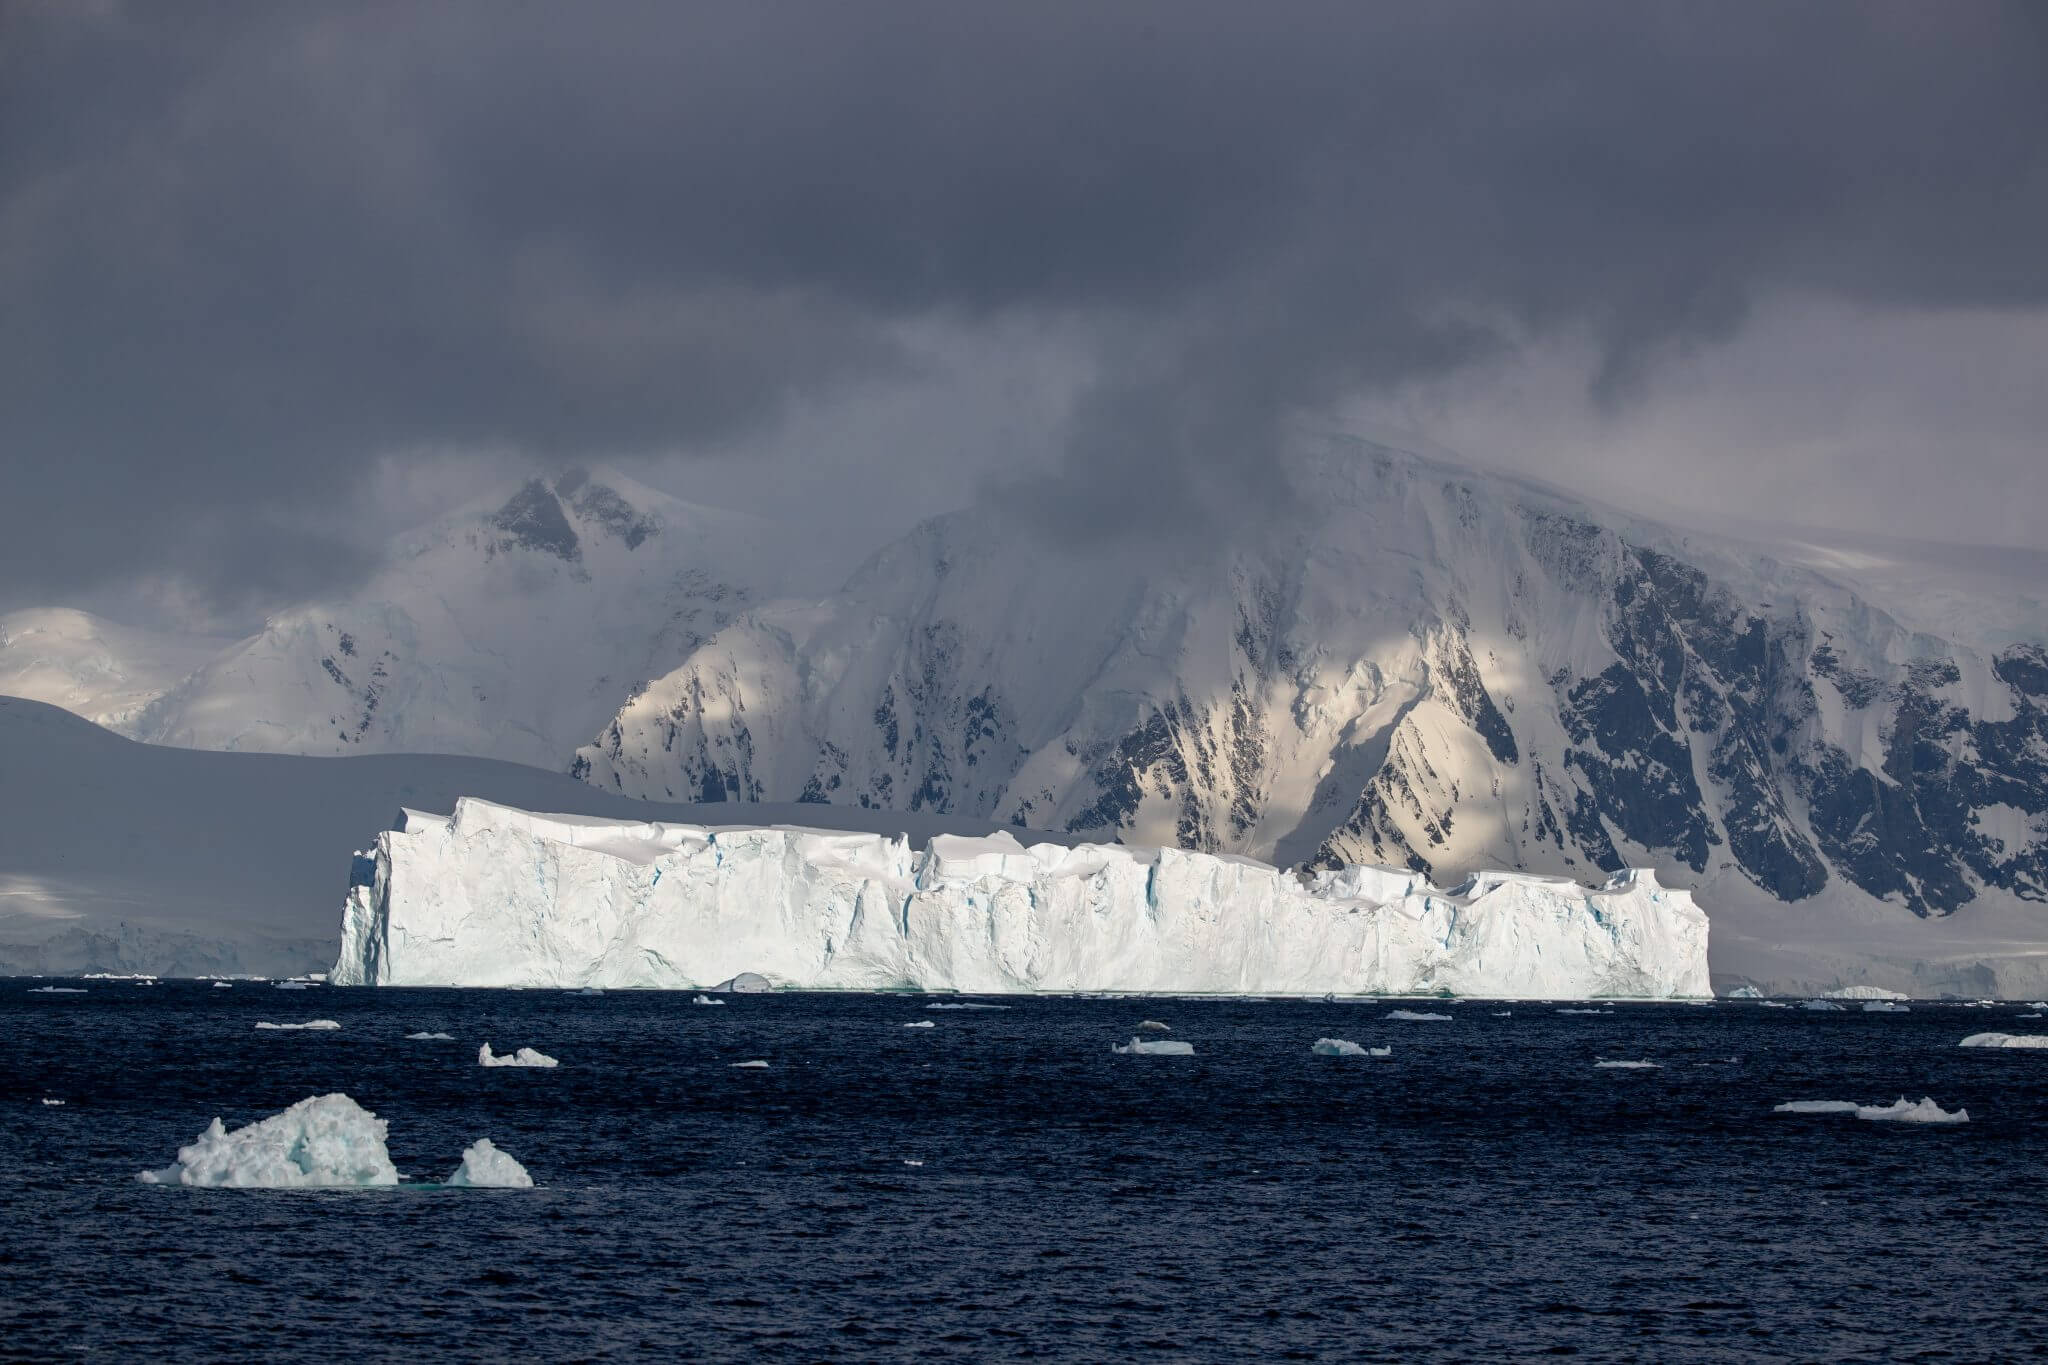 A city of icebergs in Antarctica - Cookson Adventures